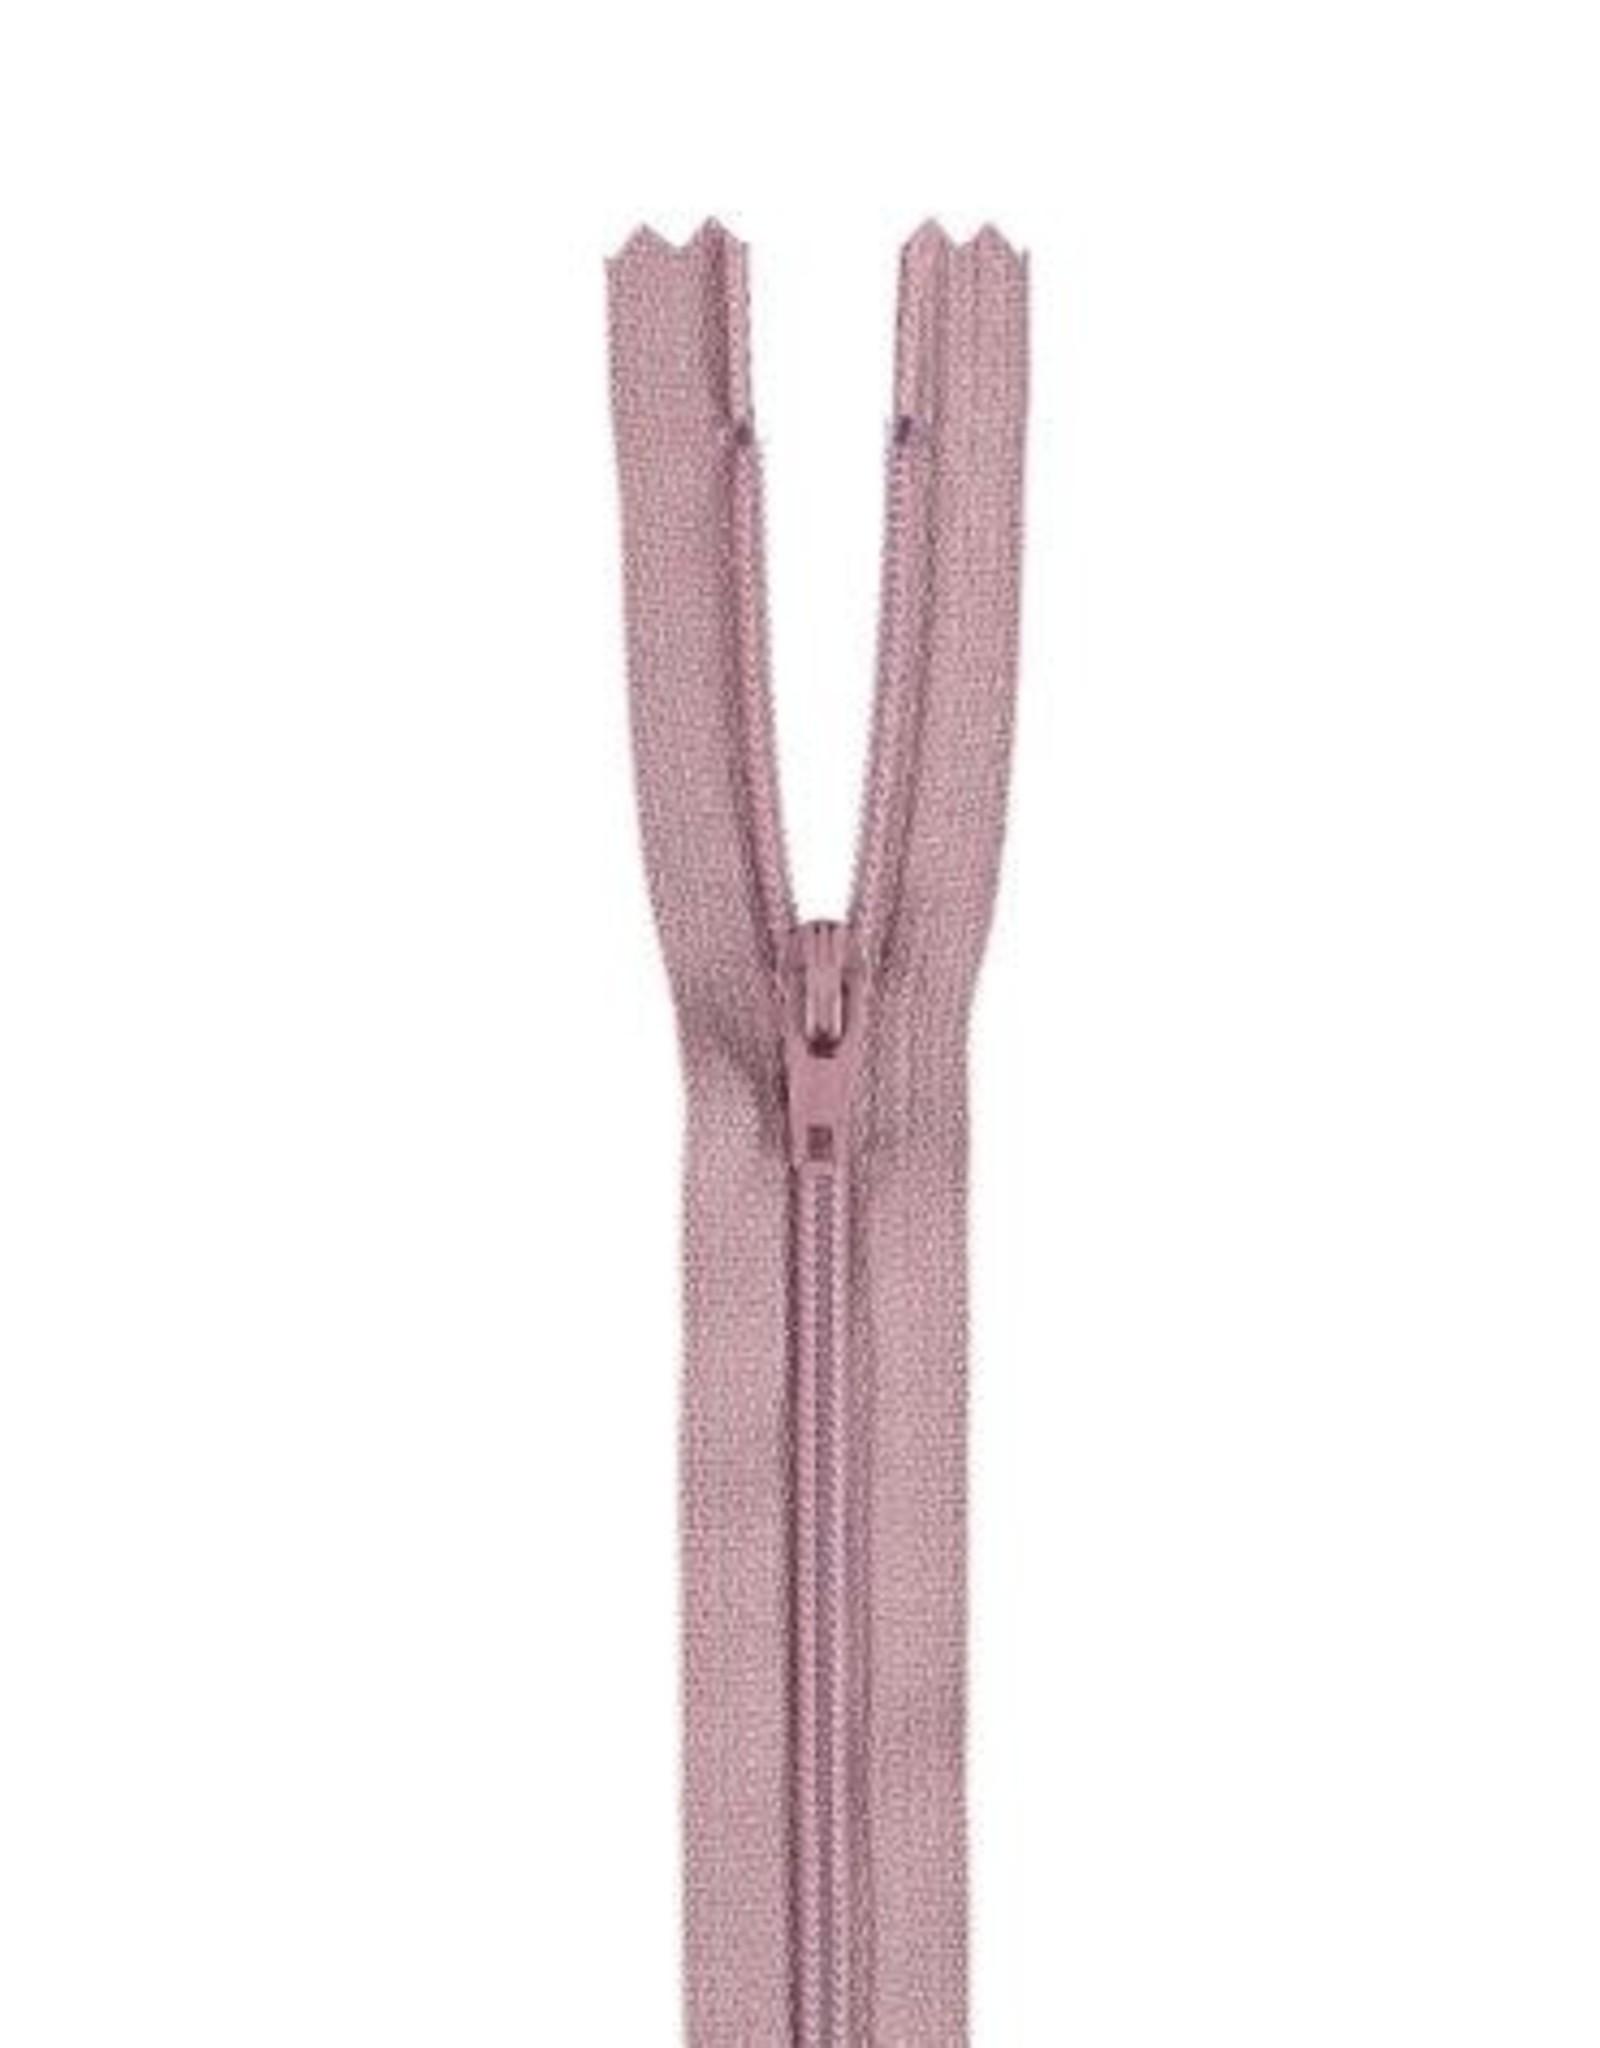 YKK Spiraalrits niet-DB 3mm oud roze 069-12cm